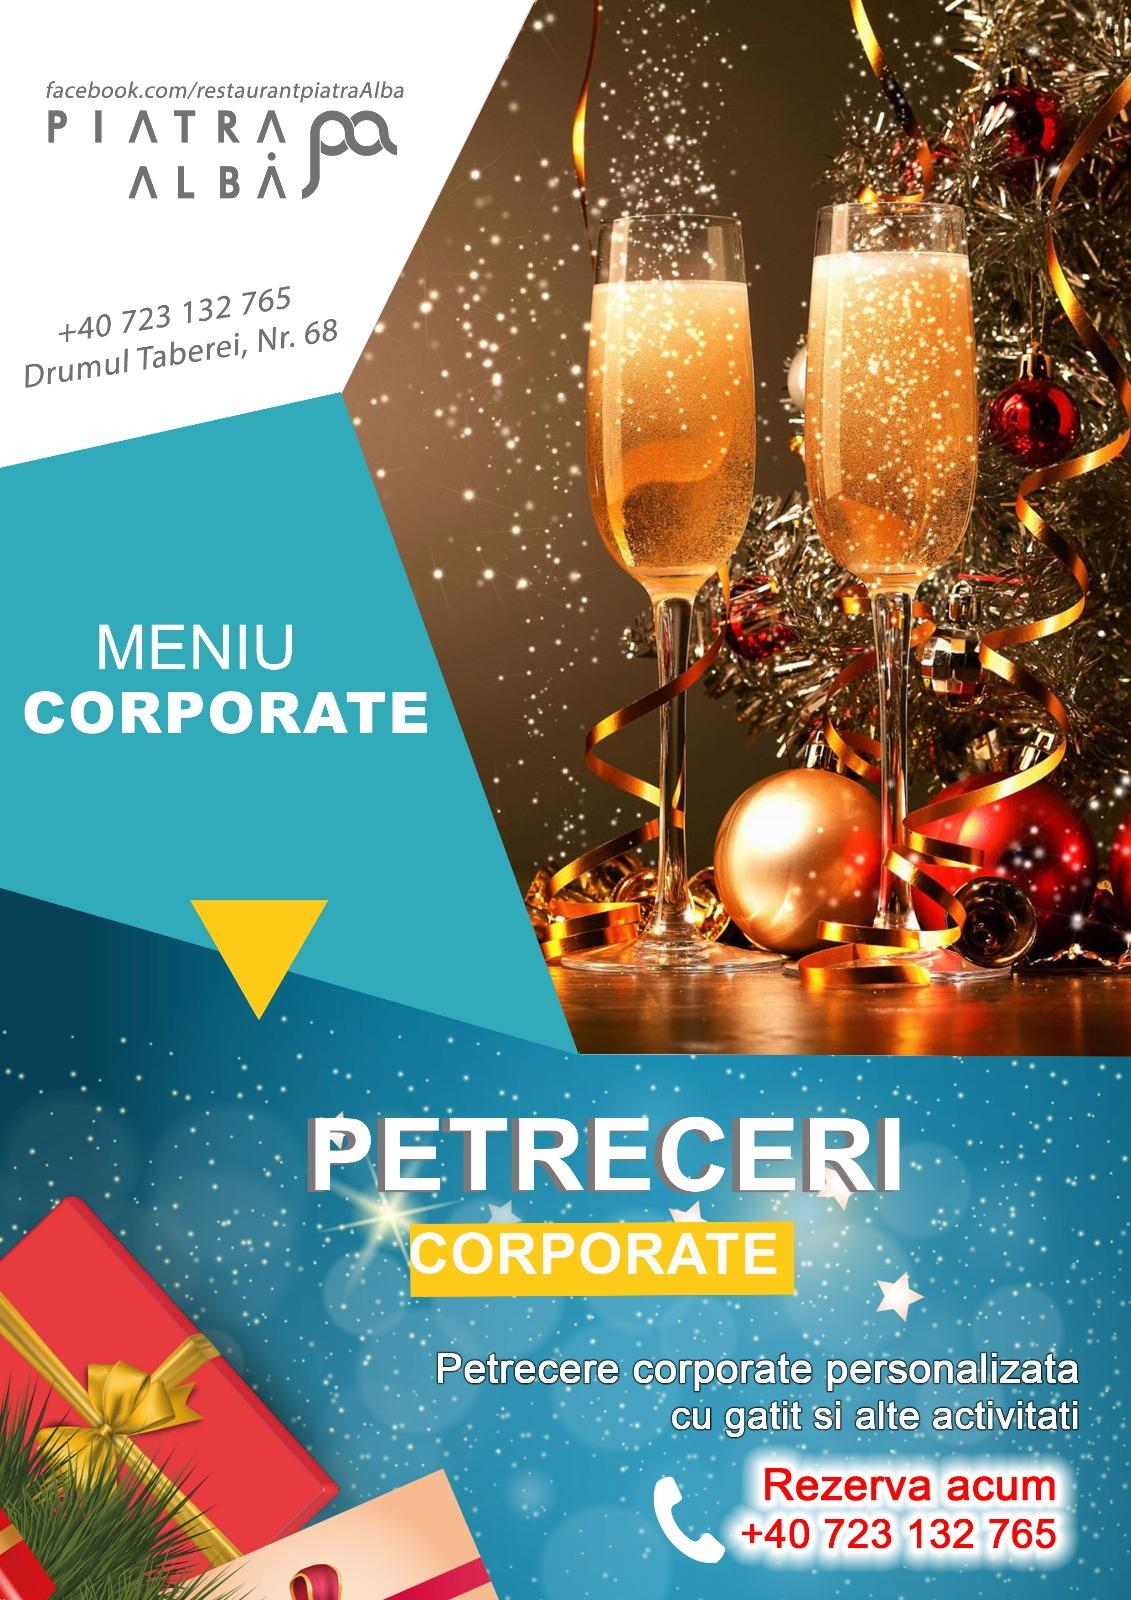 Petreceri Restaurant Piatra Alba